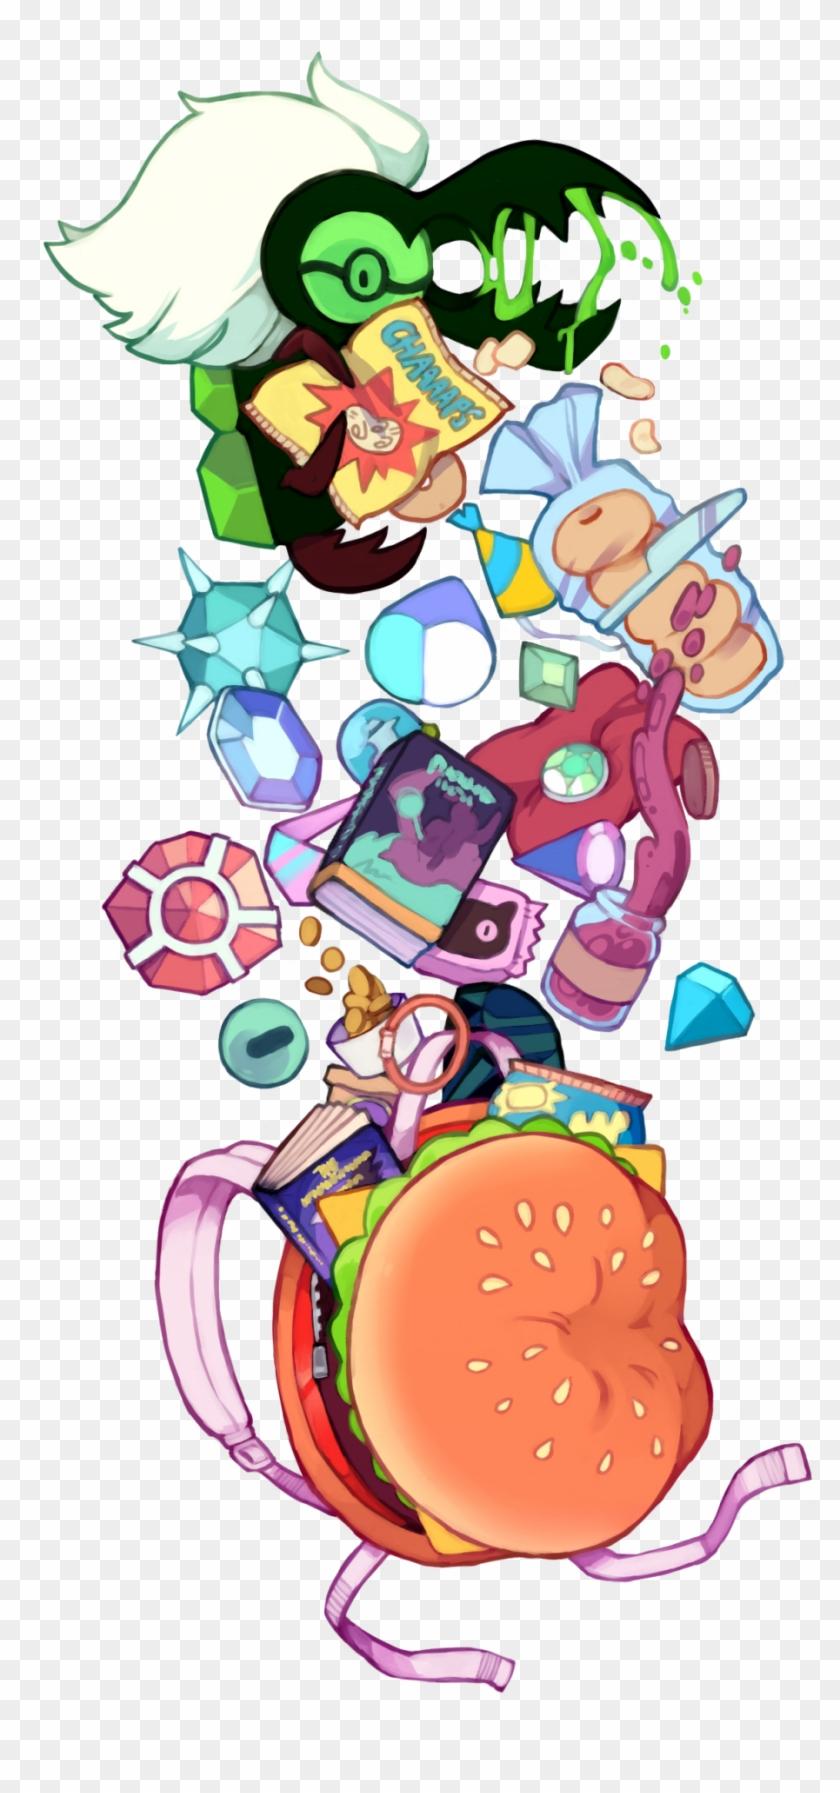 Su Steven Universe Cookie Cat Cheeseburger Backpack - Steven Universe Corrupted Gems Fanart Clipart #4118516